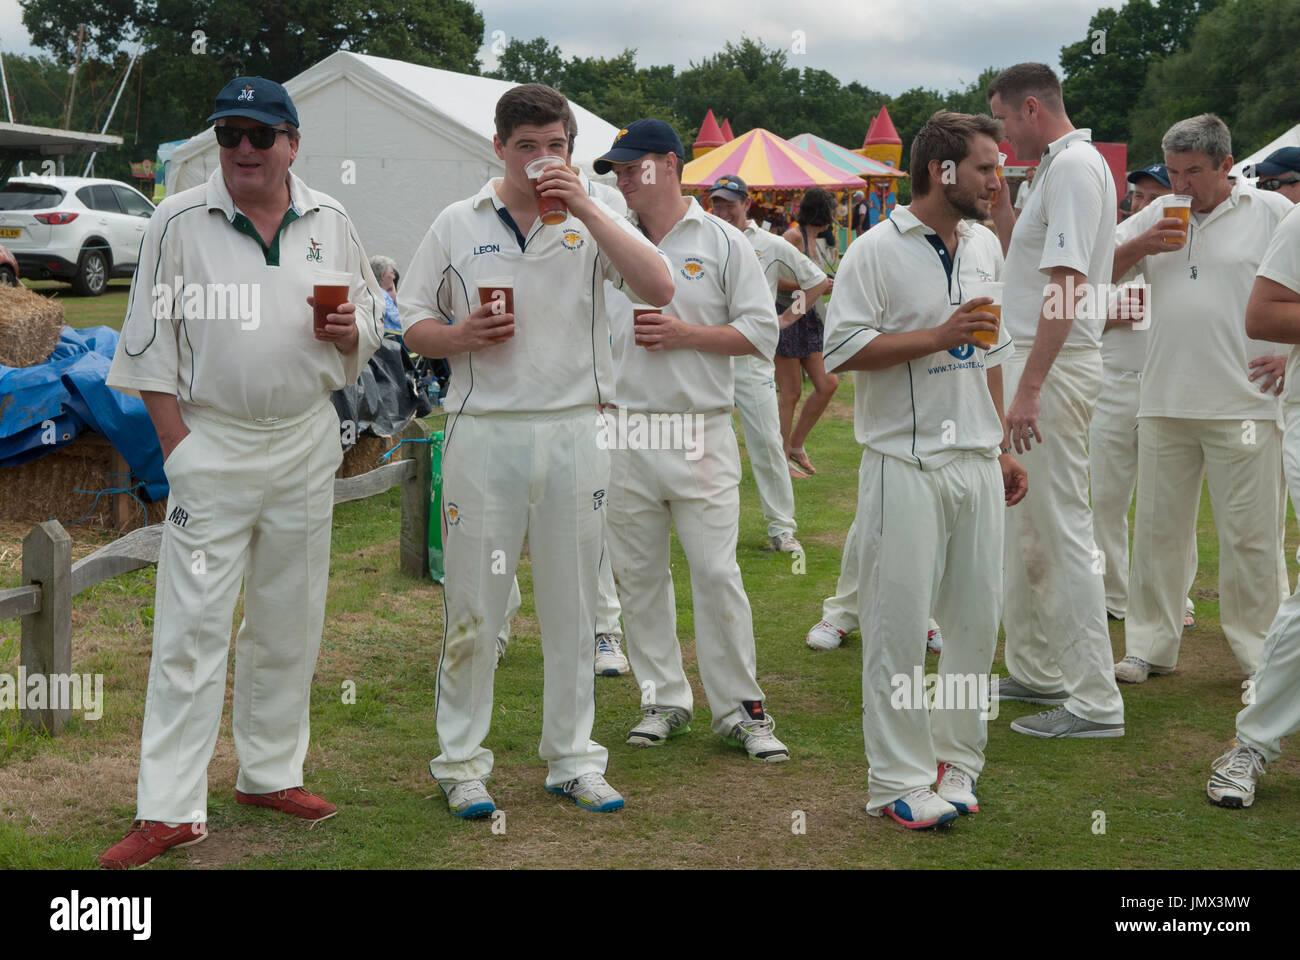 Cricket team pints of beer English village life England Uk HOMER SYKES - Stock Image